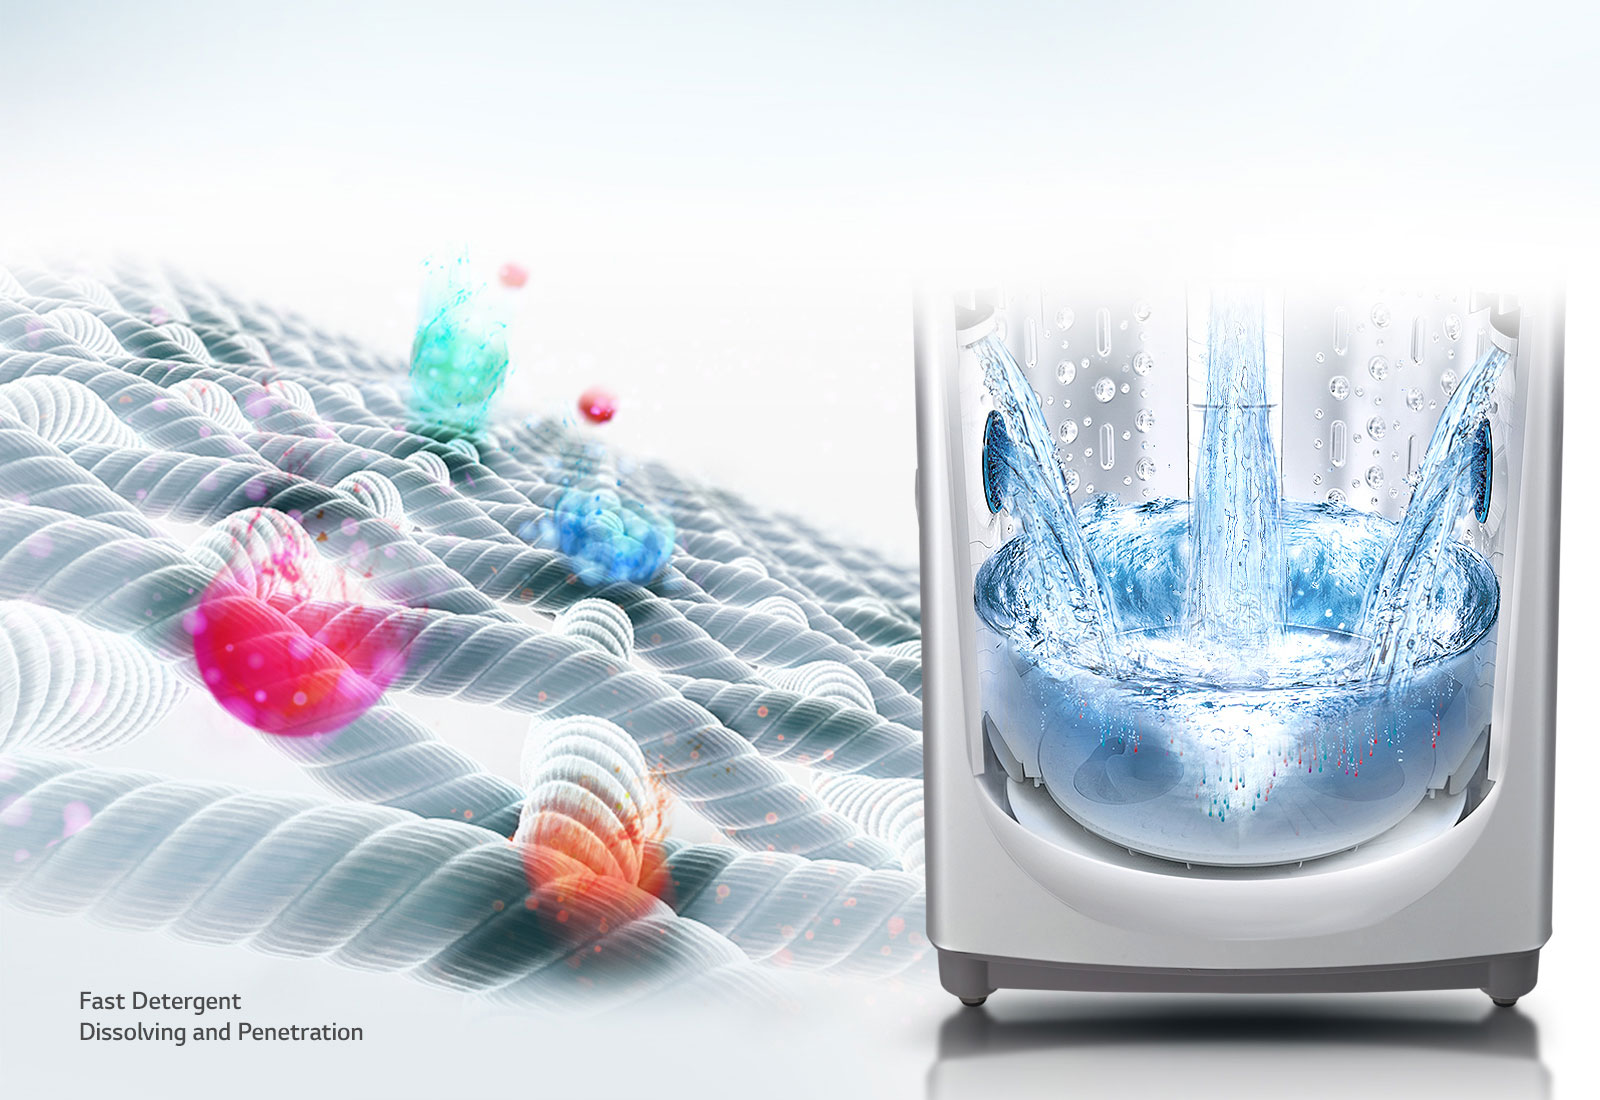 T2175VS2W_Top-Load-Washing-Machines_SideWaterfall_D_V1